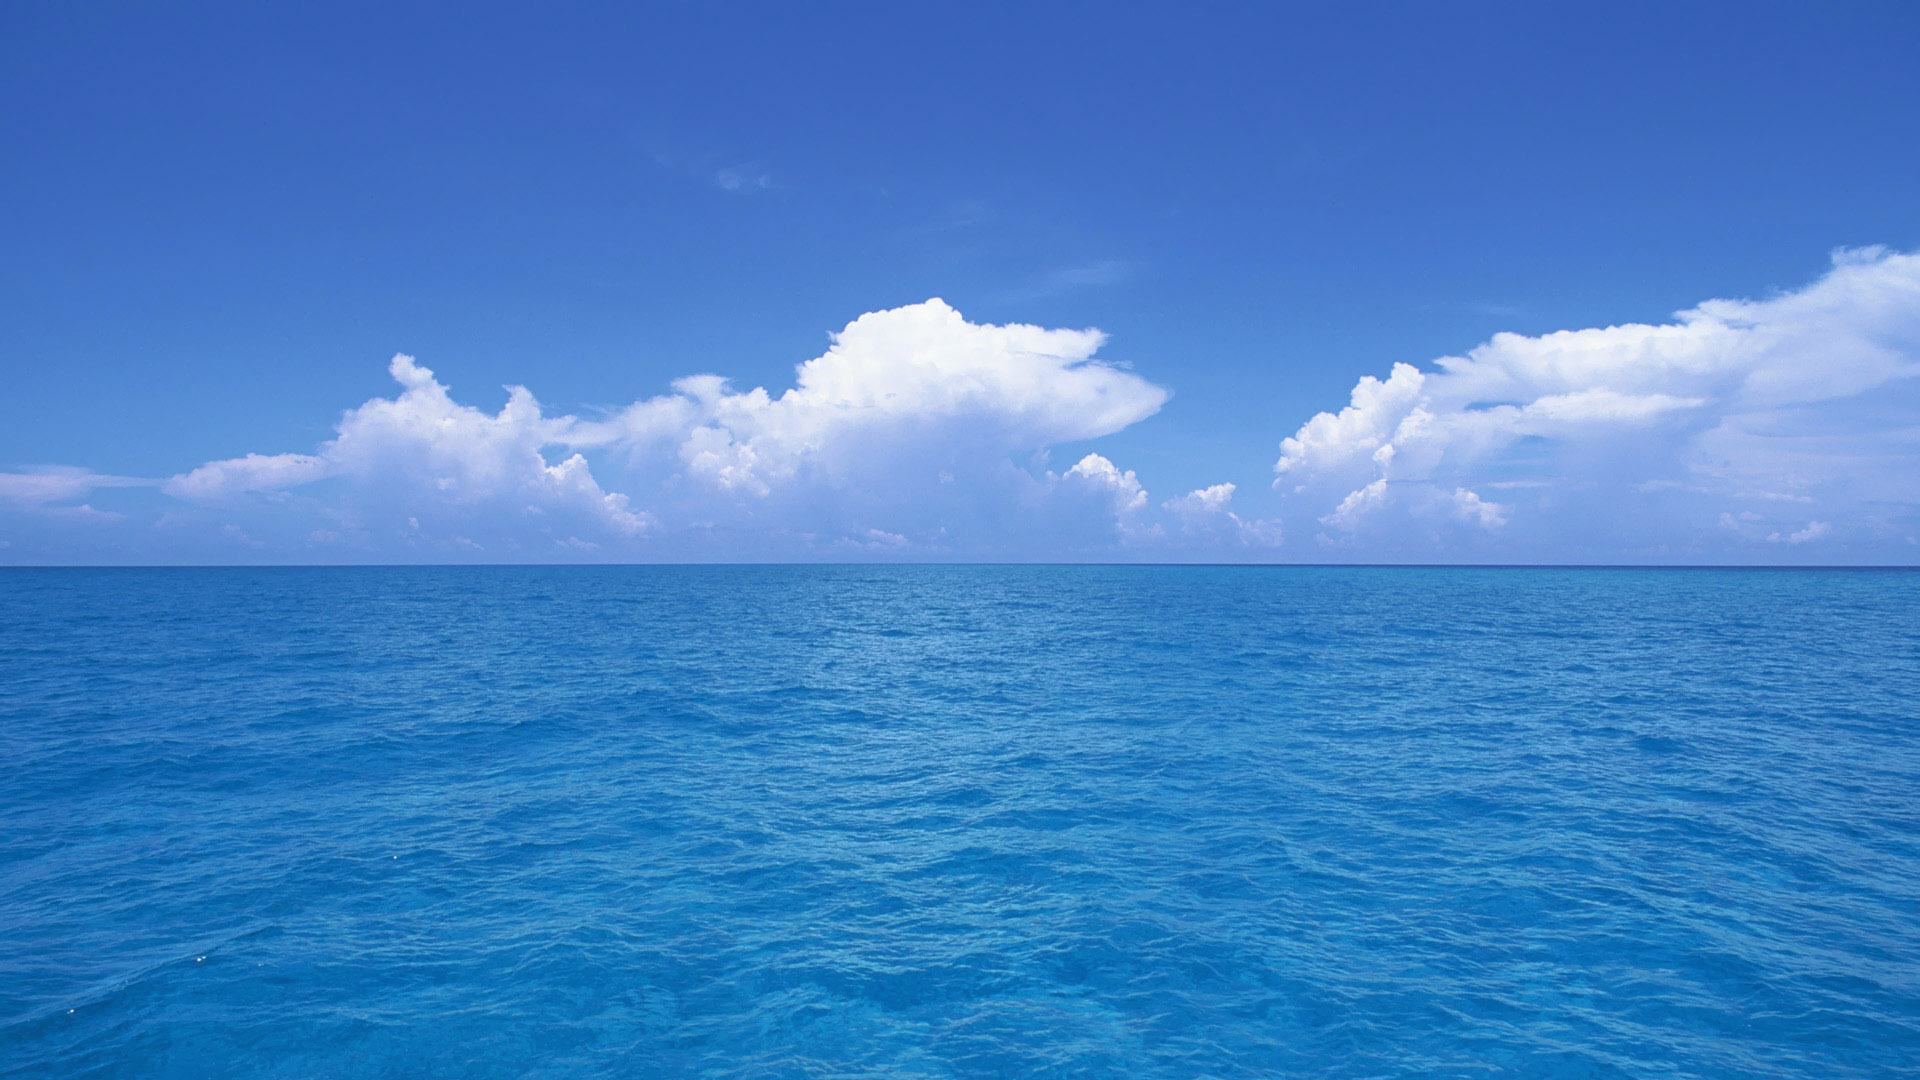 Google underwater theme - Ocean Desktop Themes Wallpaper Hd 1920x1080 5381